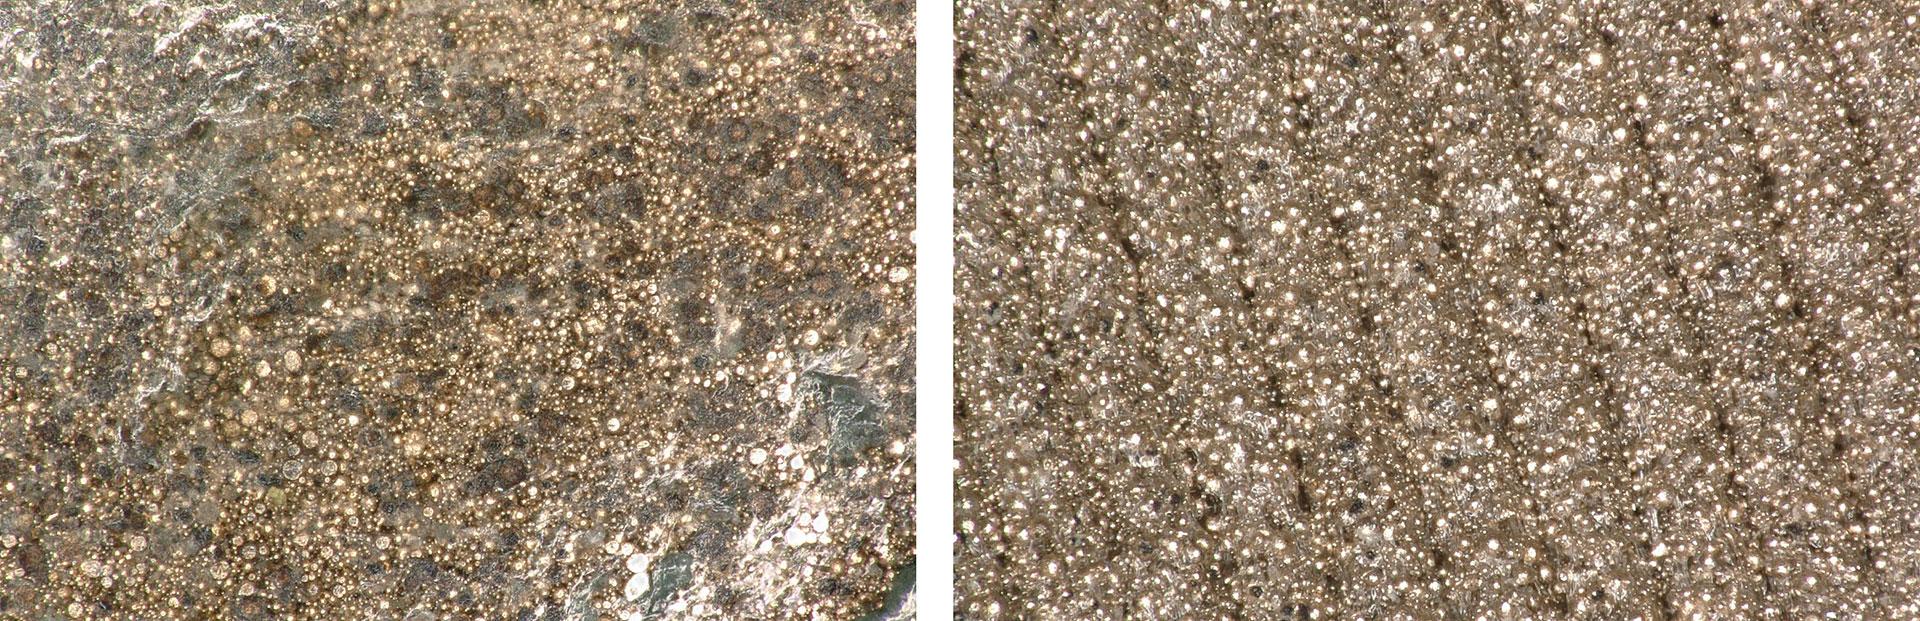 bronzefill_microscoop